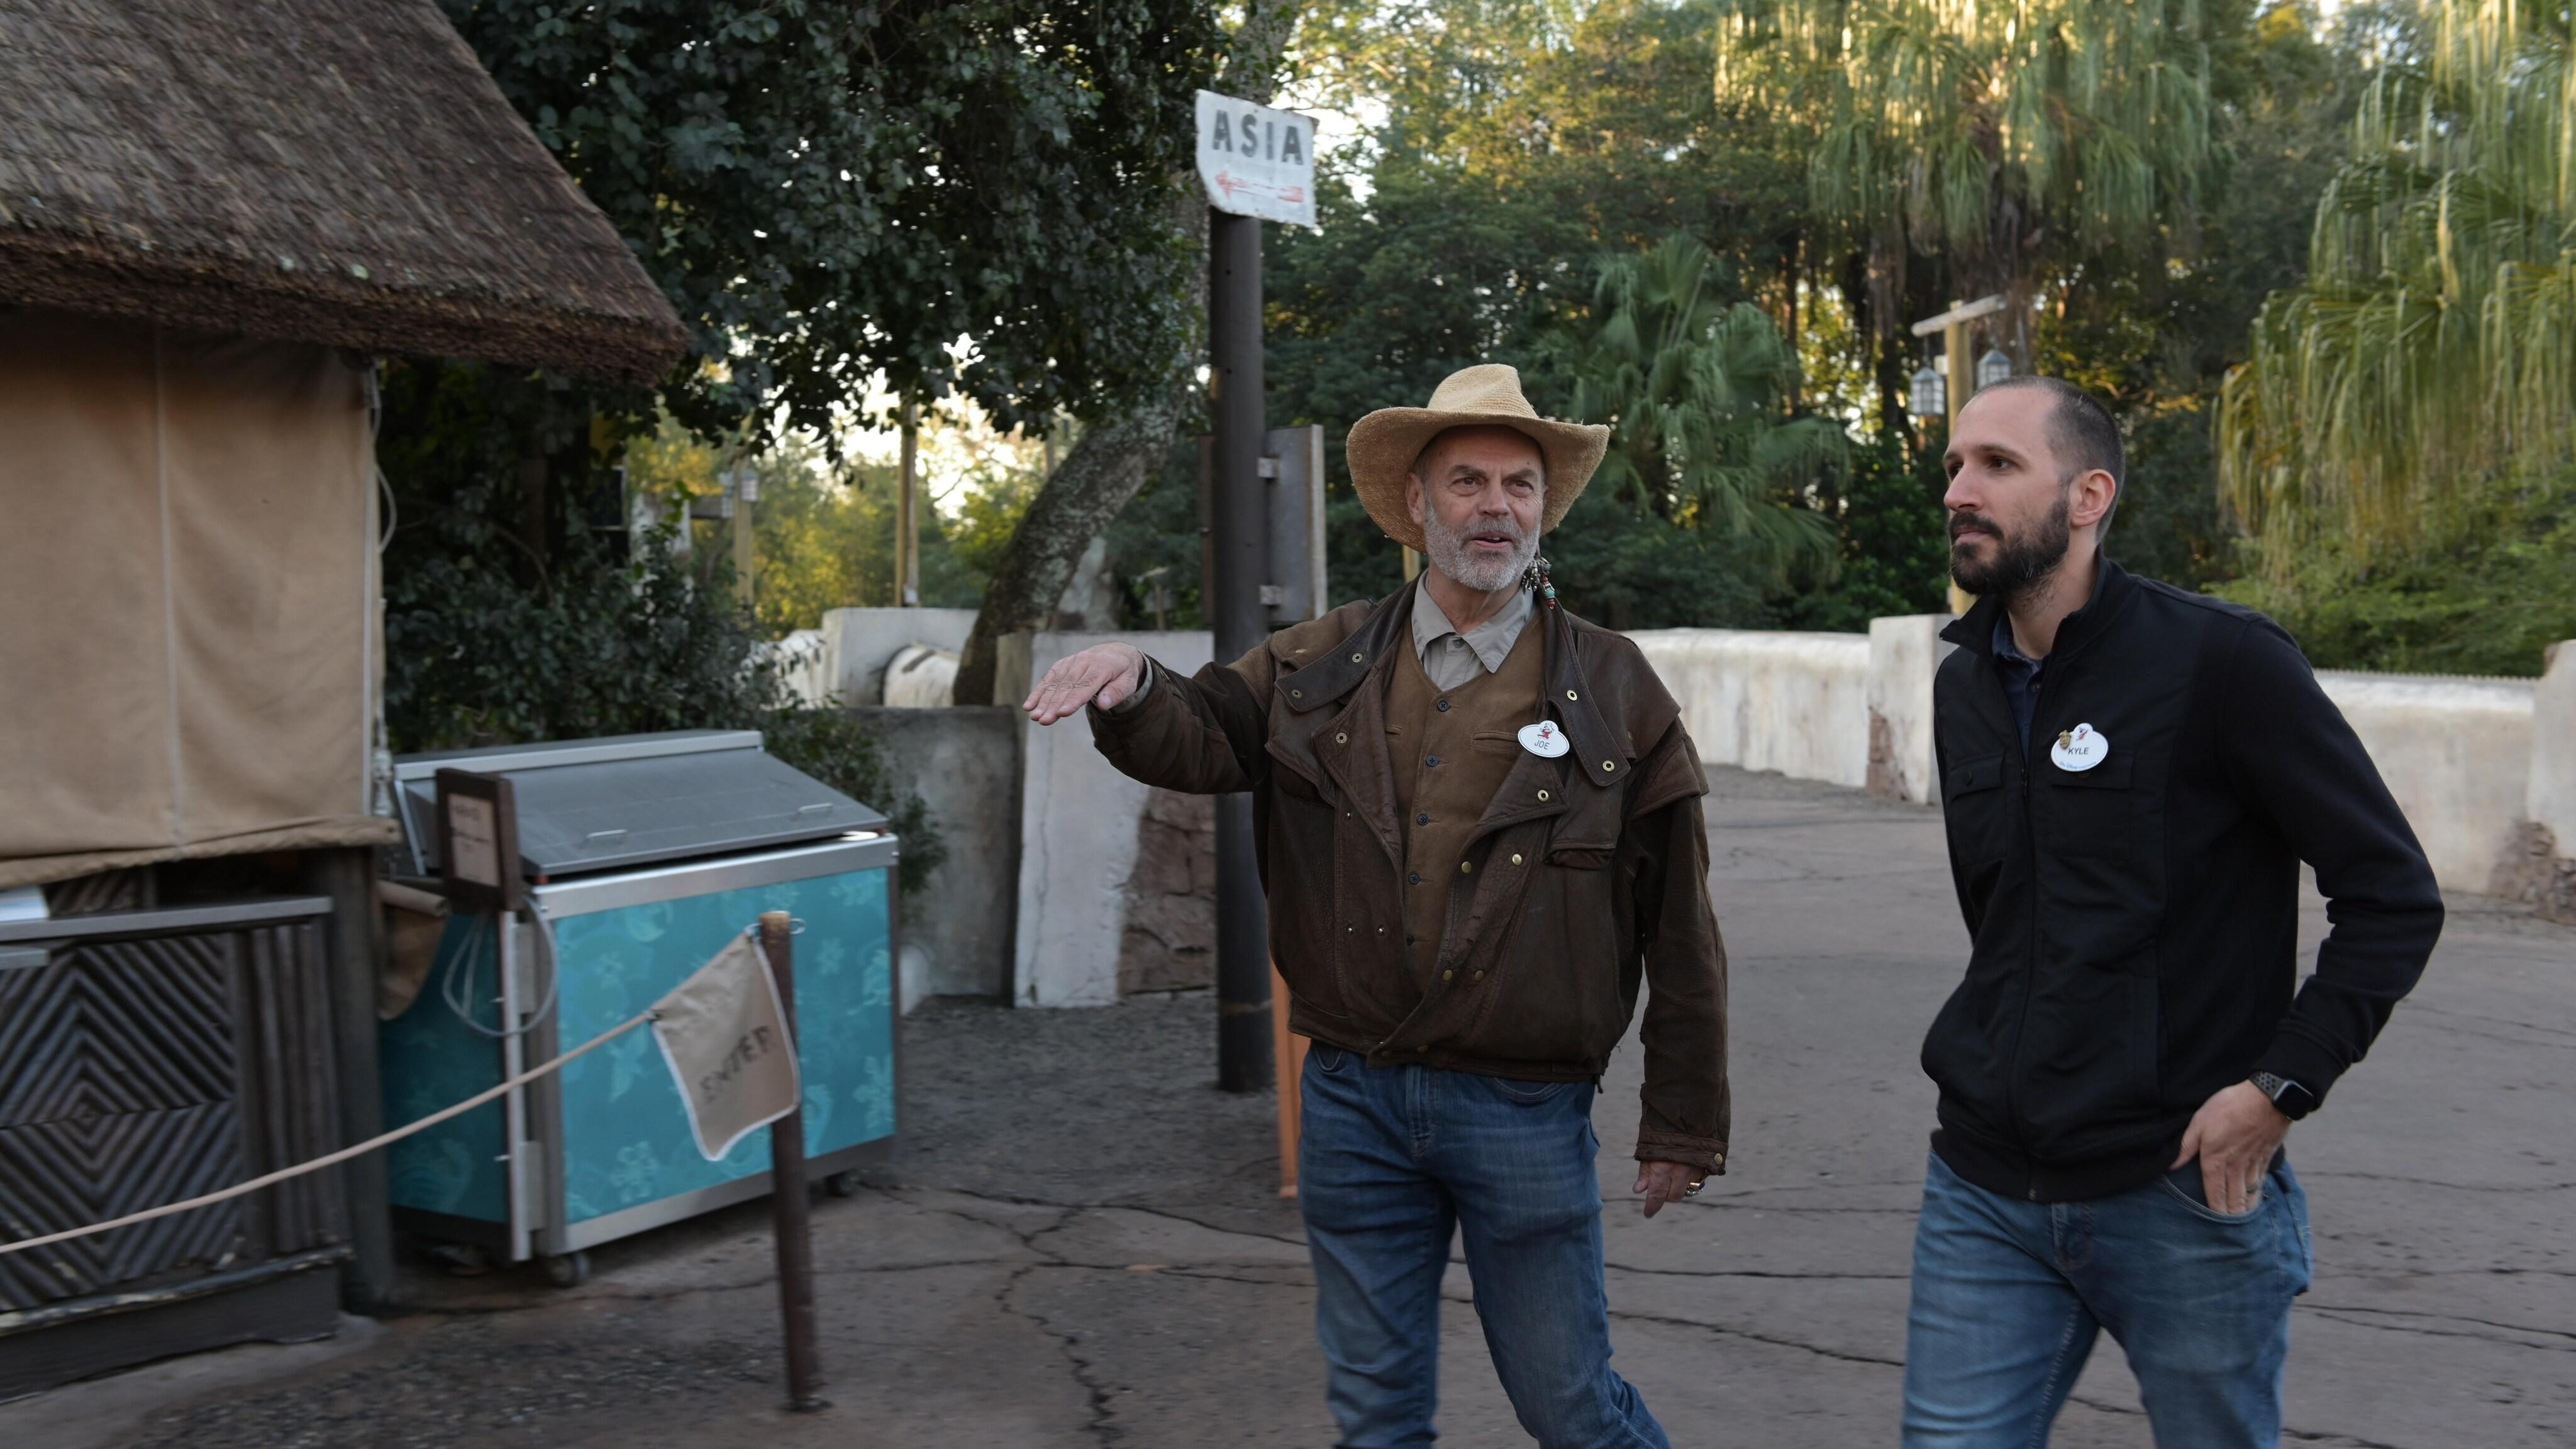 Joe Rohde (Creative Portfolio Executive Walt Disney Imagineering), Kyle Price (Art Director). Joe and Kyle walk along the park path. (Charlene Guilliams/Disney)